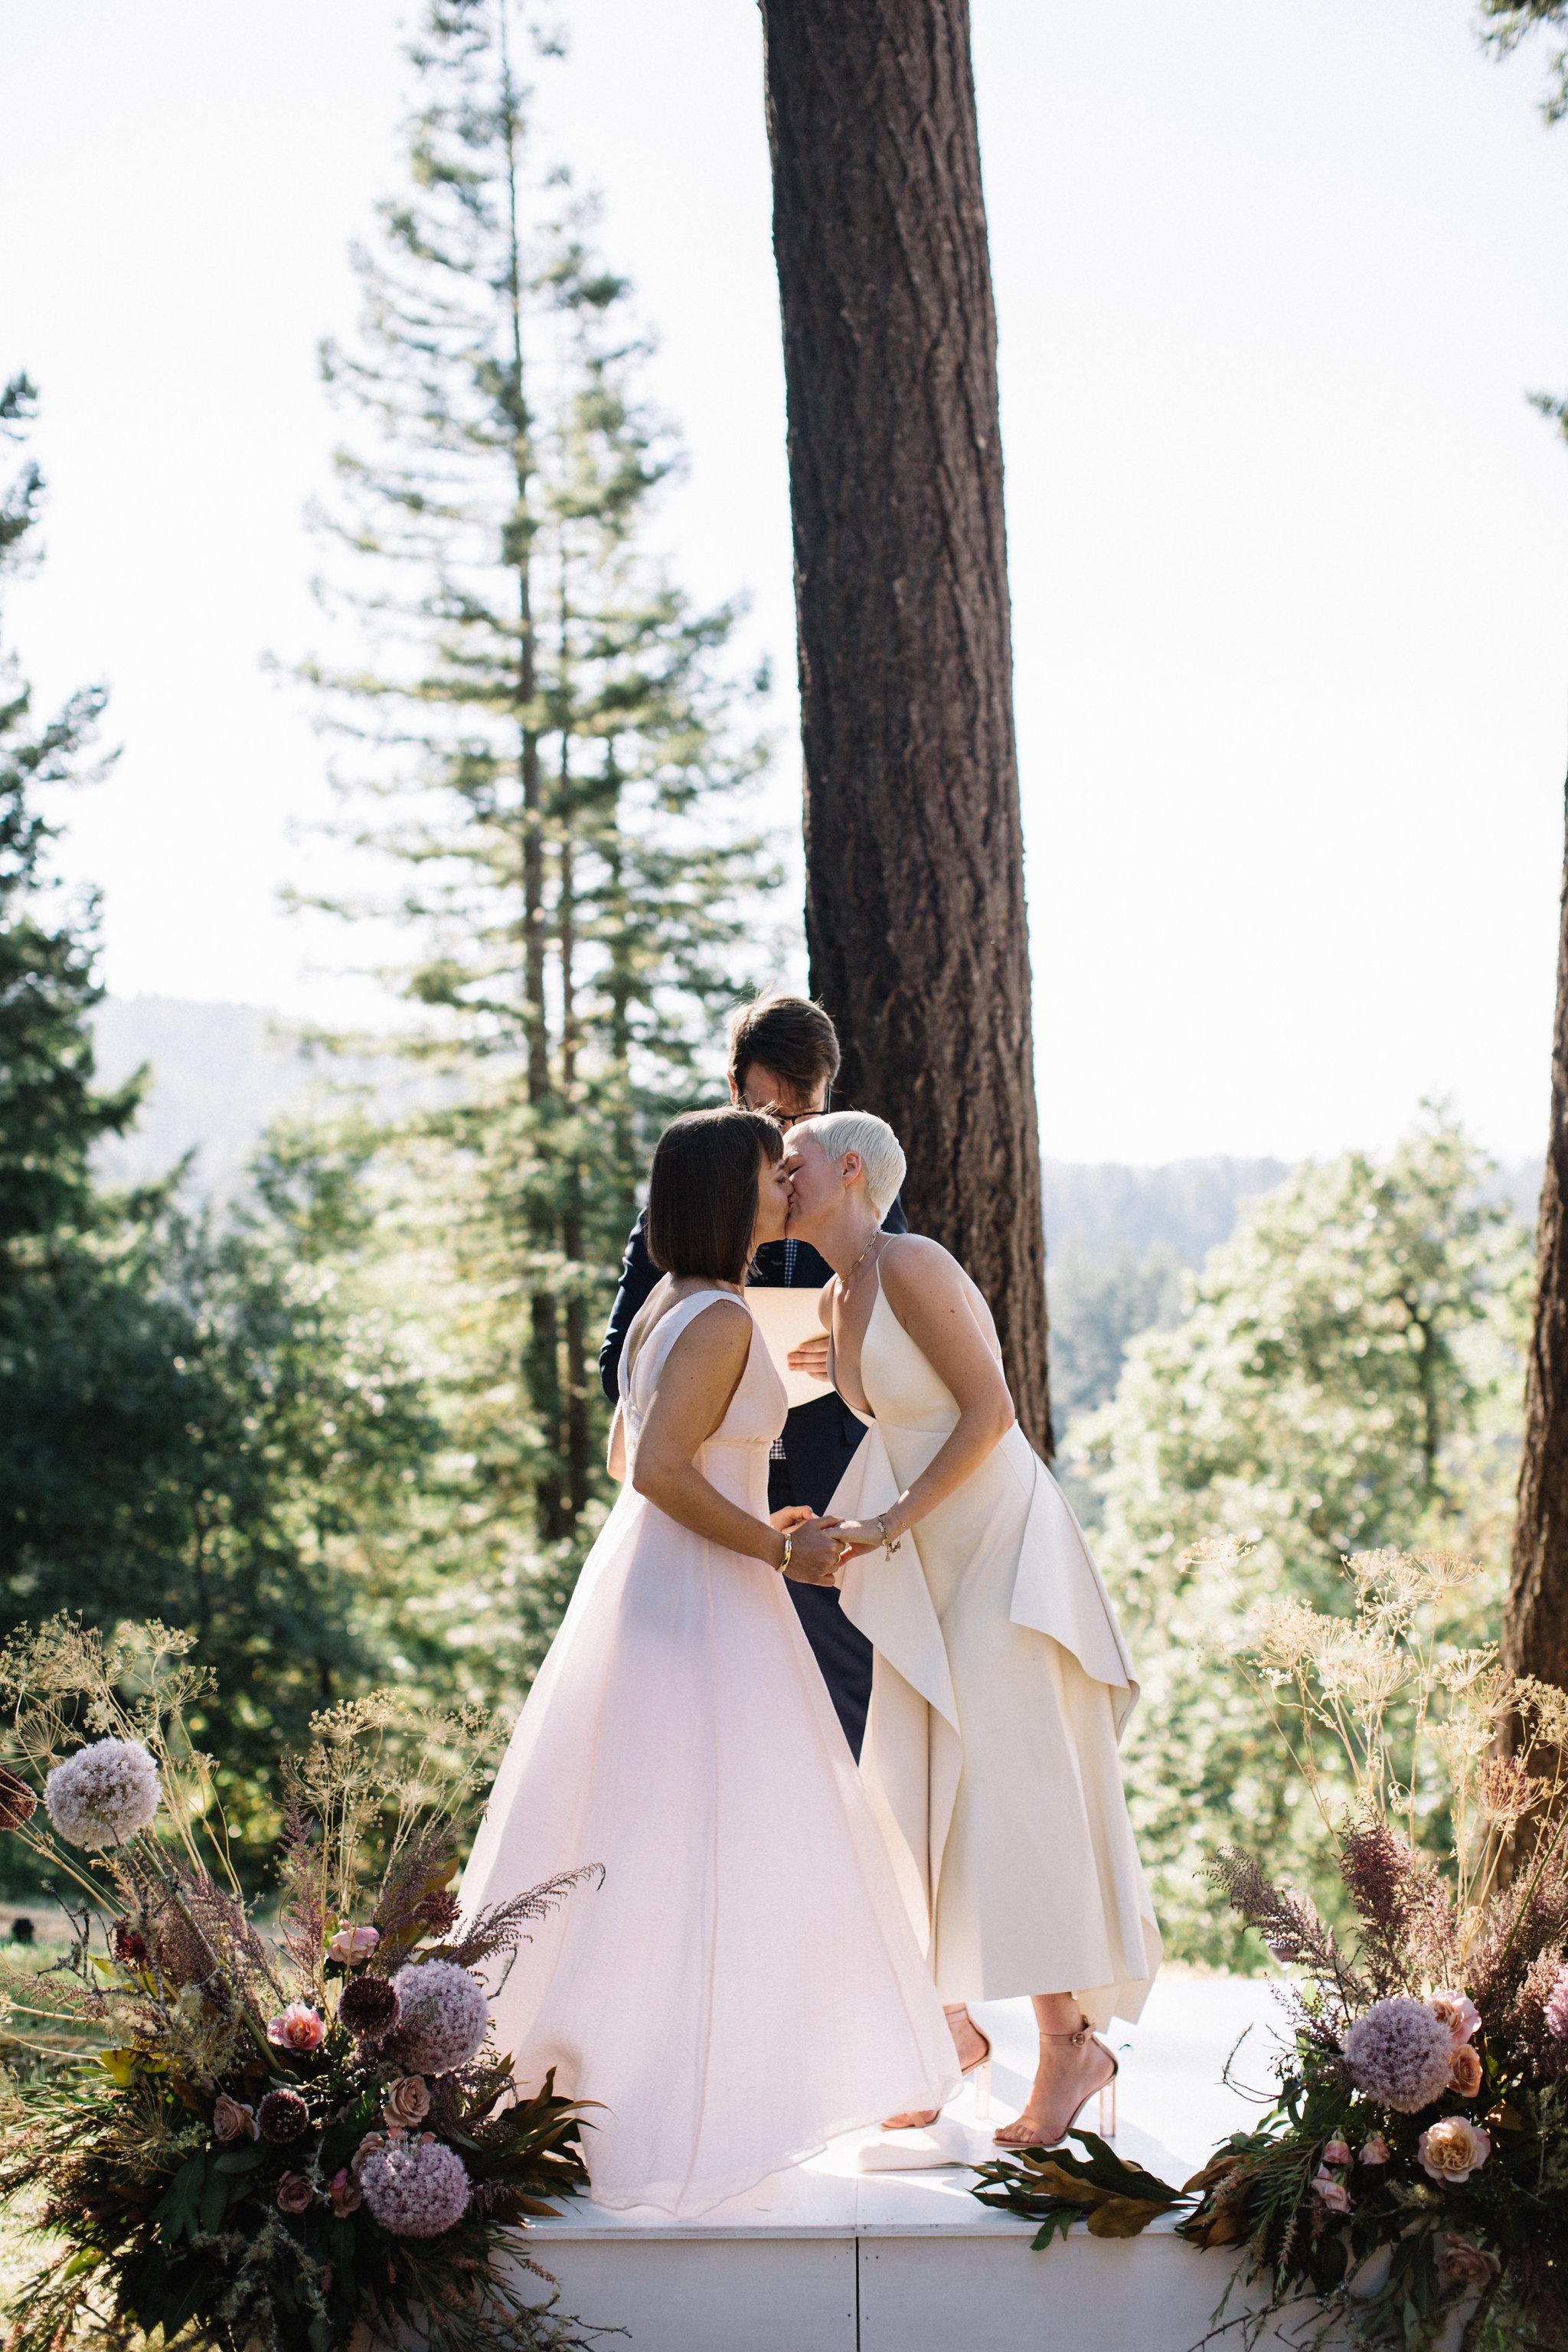 20170708_Brook+Evans_wedding_highres-310.jpg